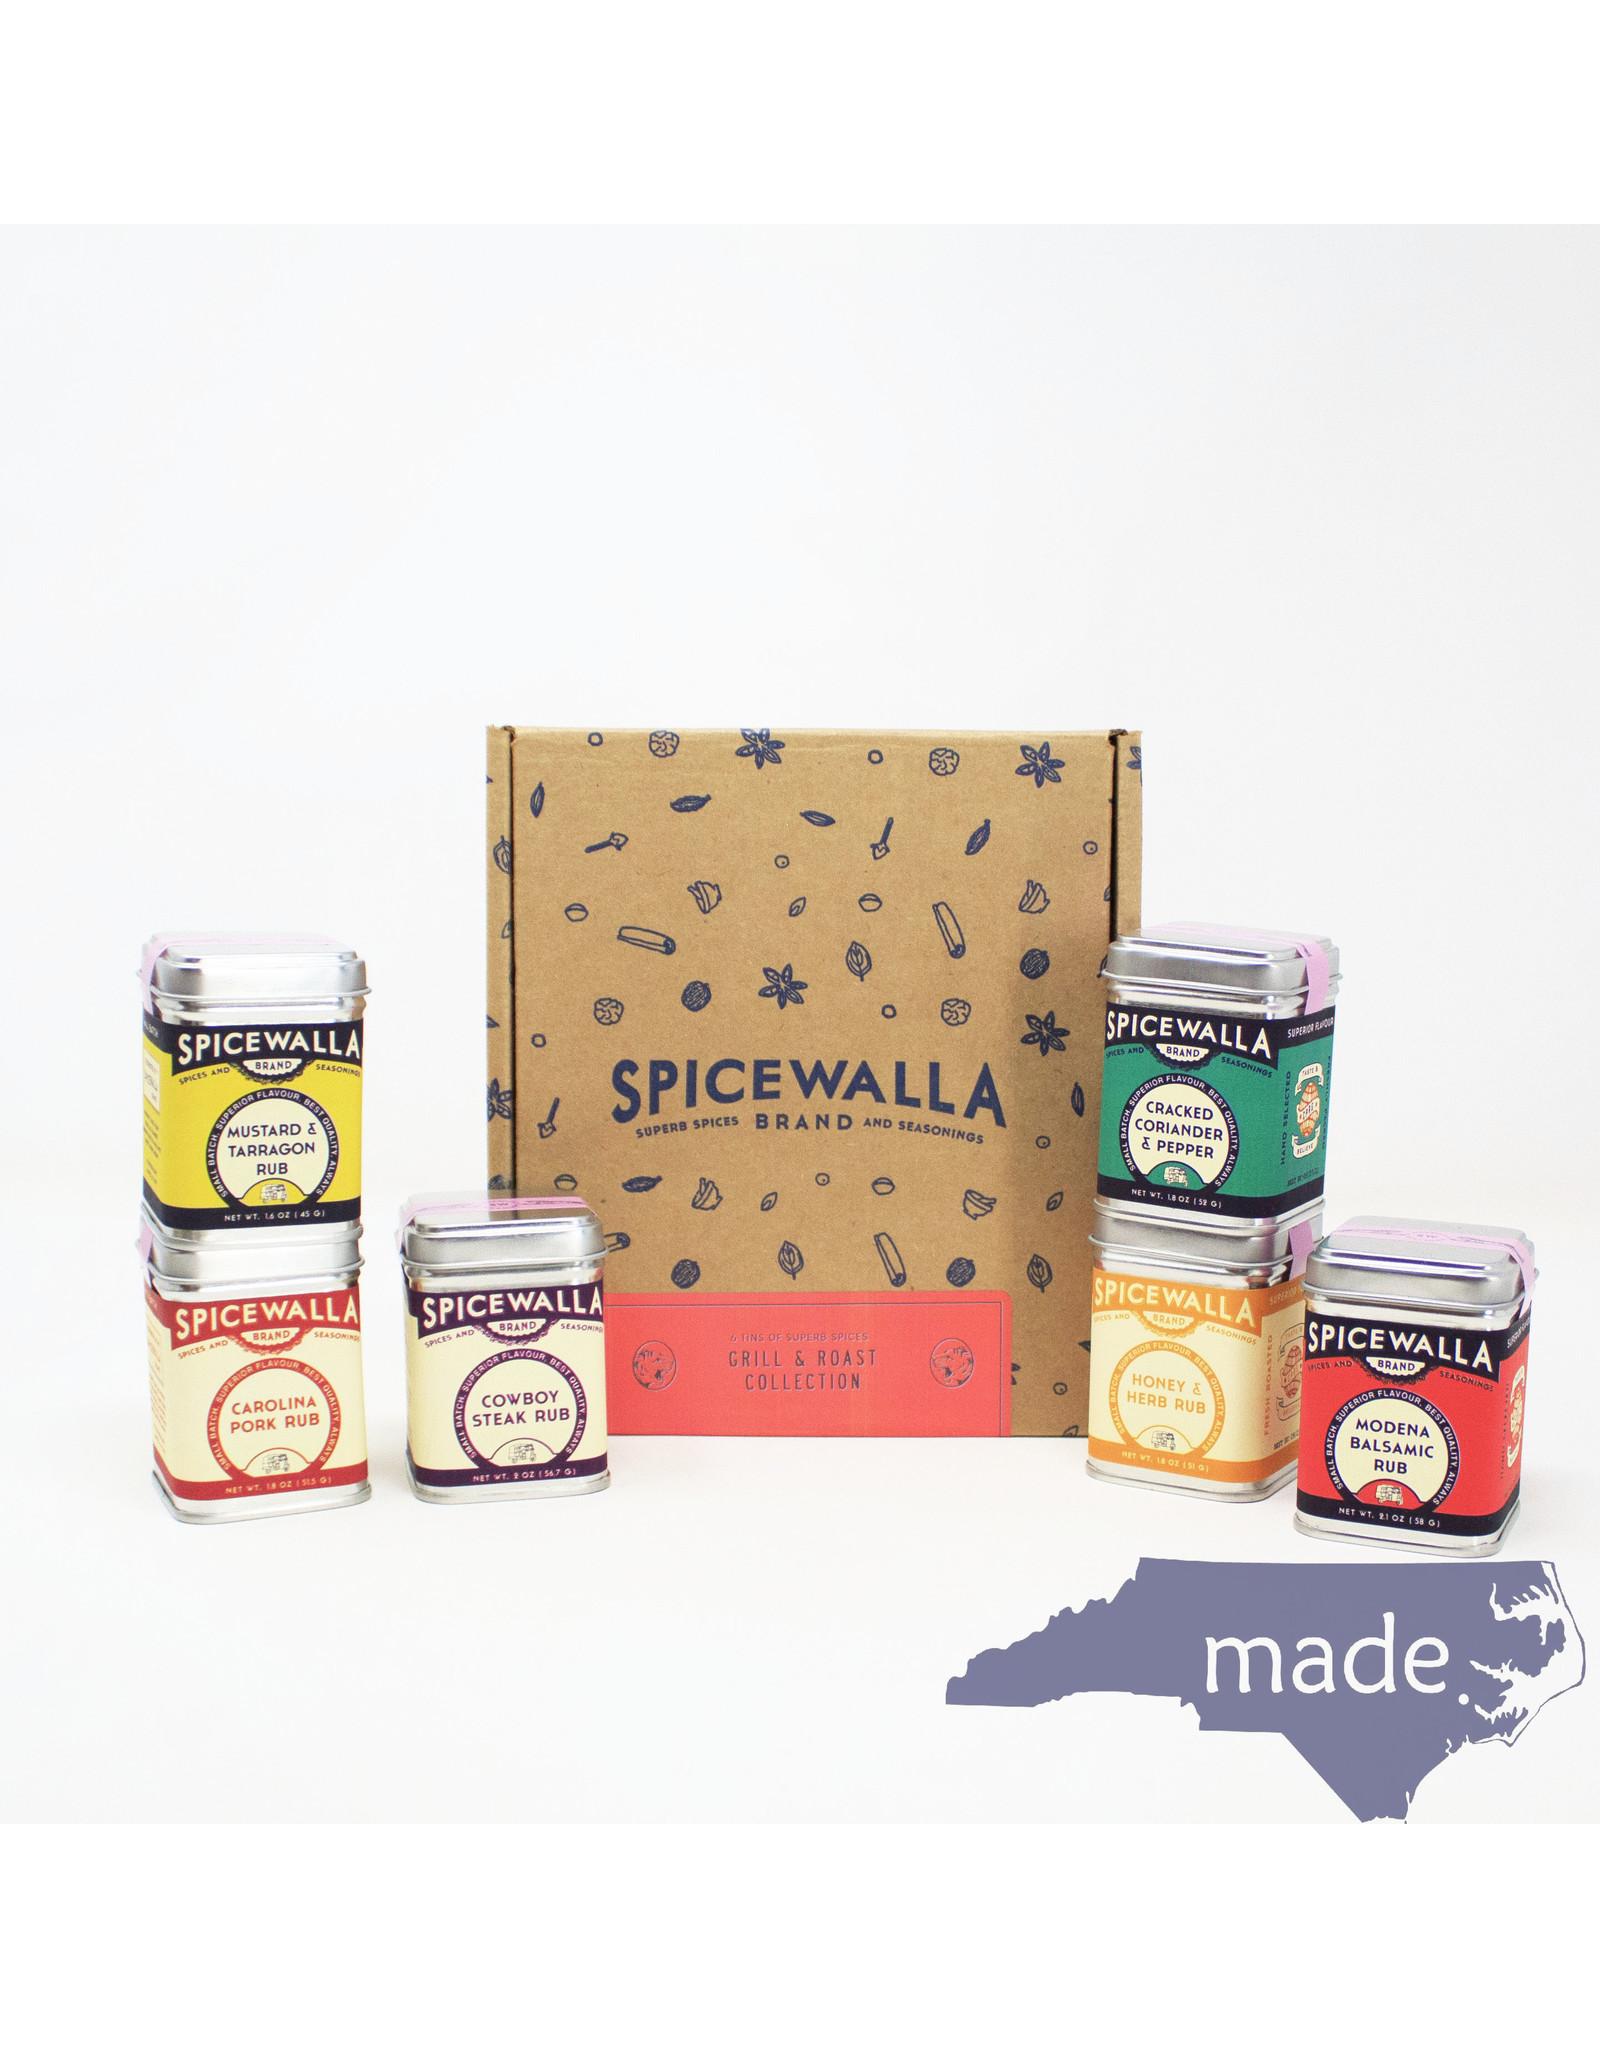 Spicewalla 6 Pack Grill & Roast Collection - Spicewalla